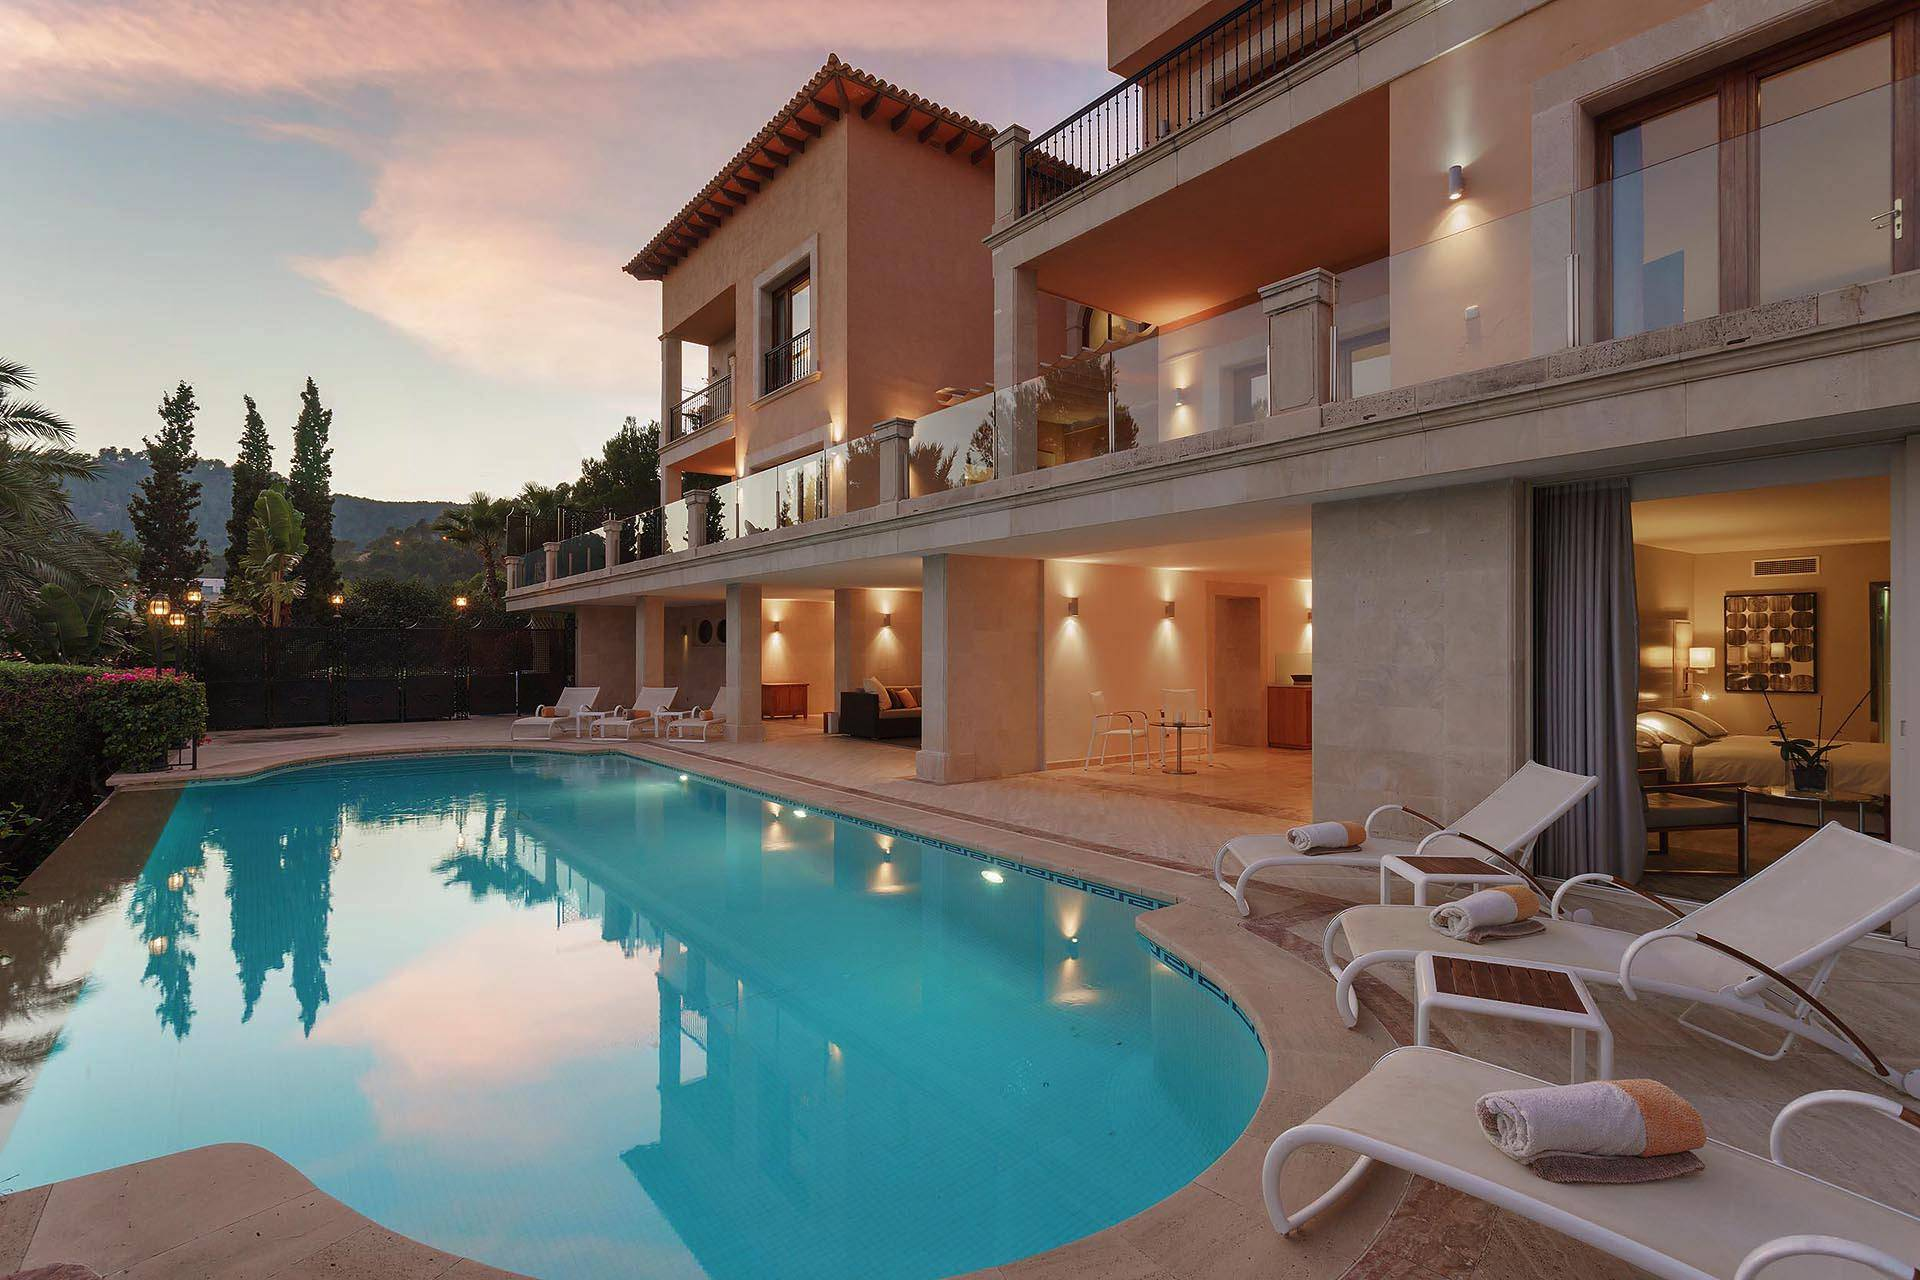 01-280 großzügige Villa nahe Palma de Mallorca Bild 14